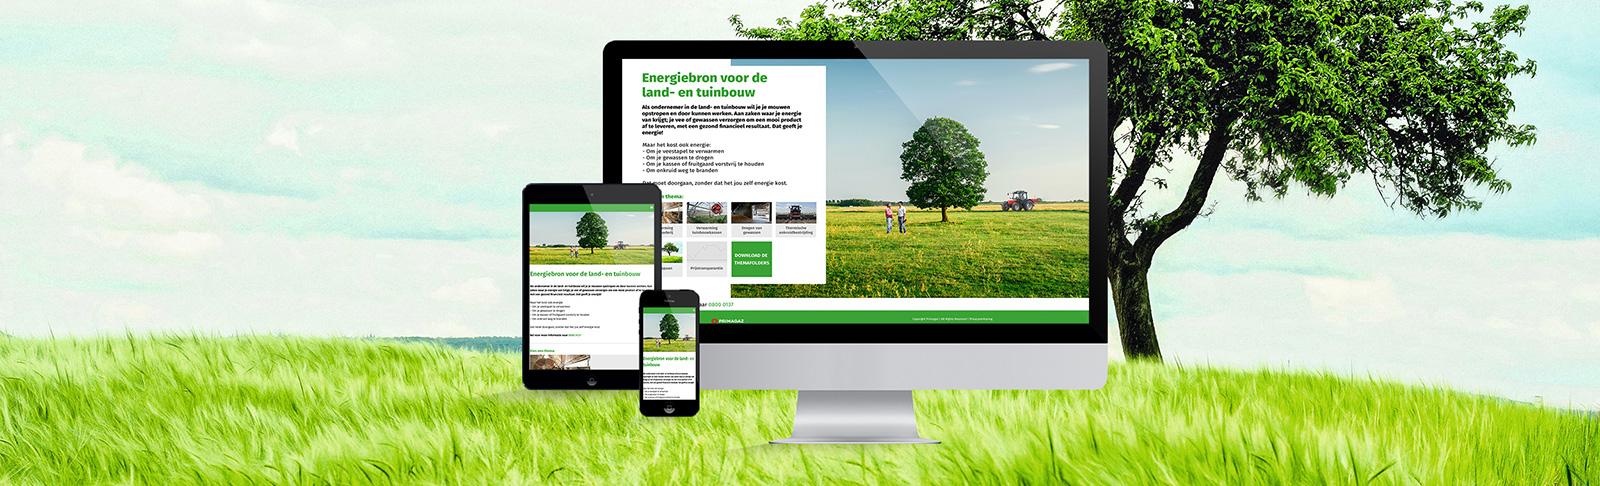 portfolio-primagaz-website-2500x759-1